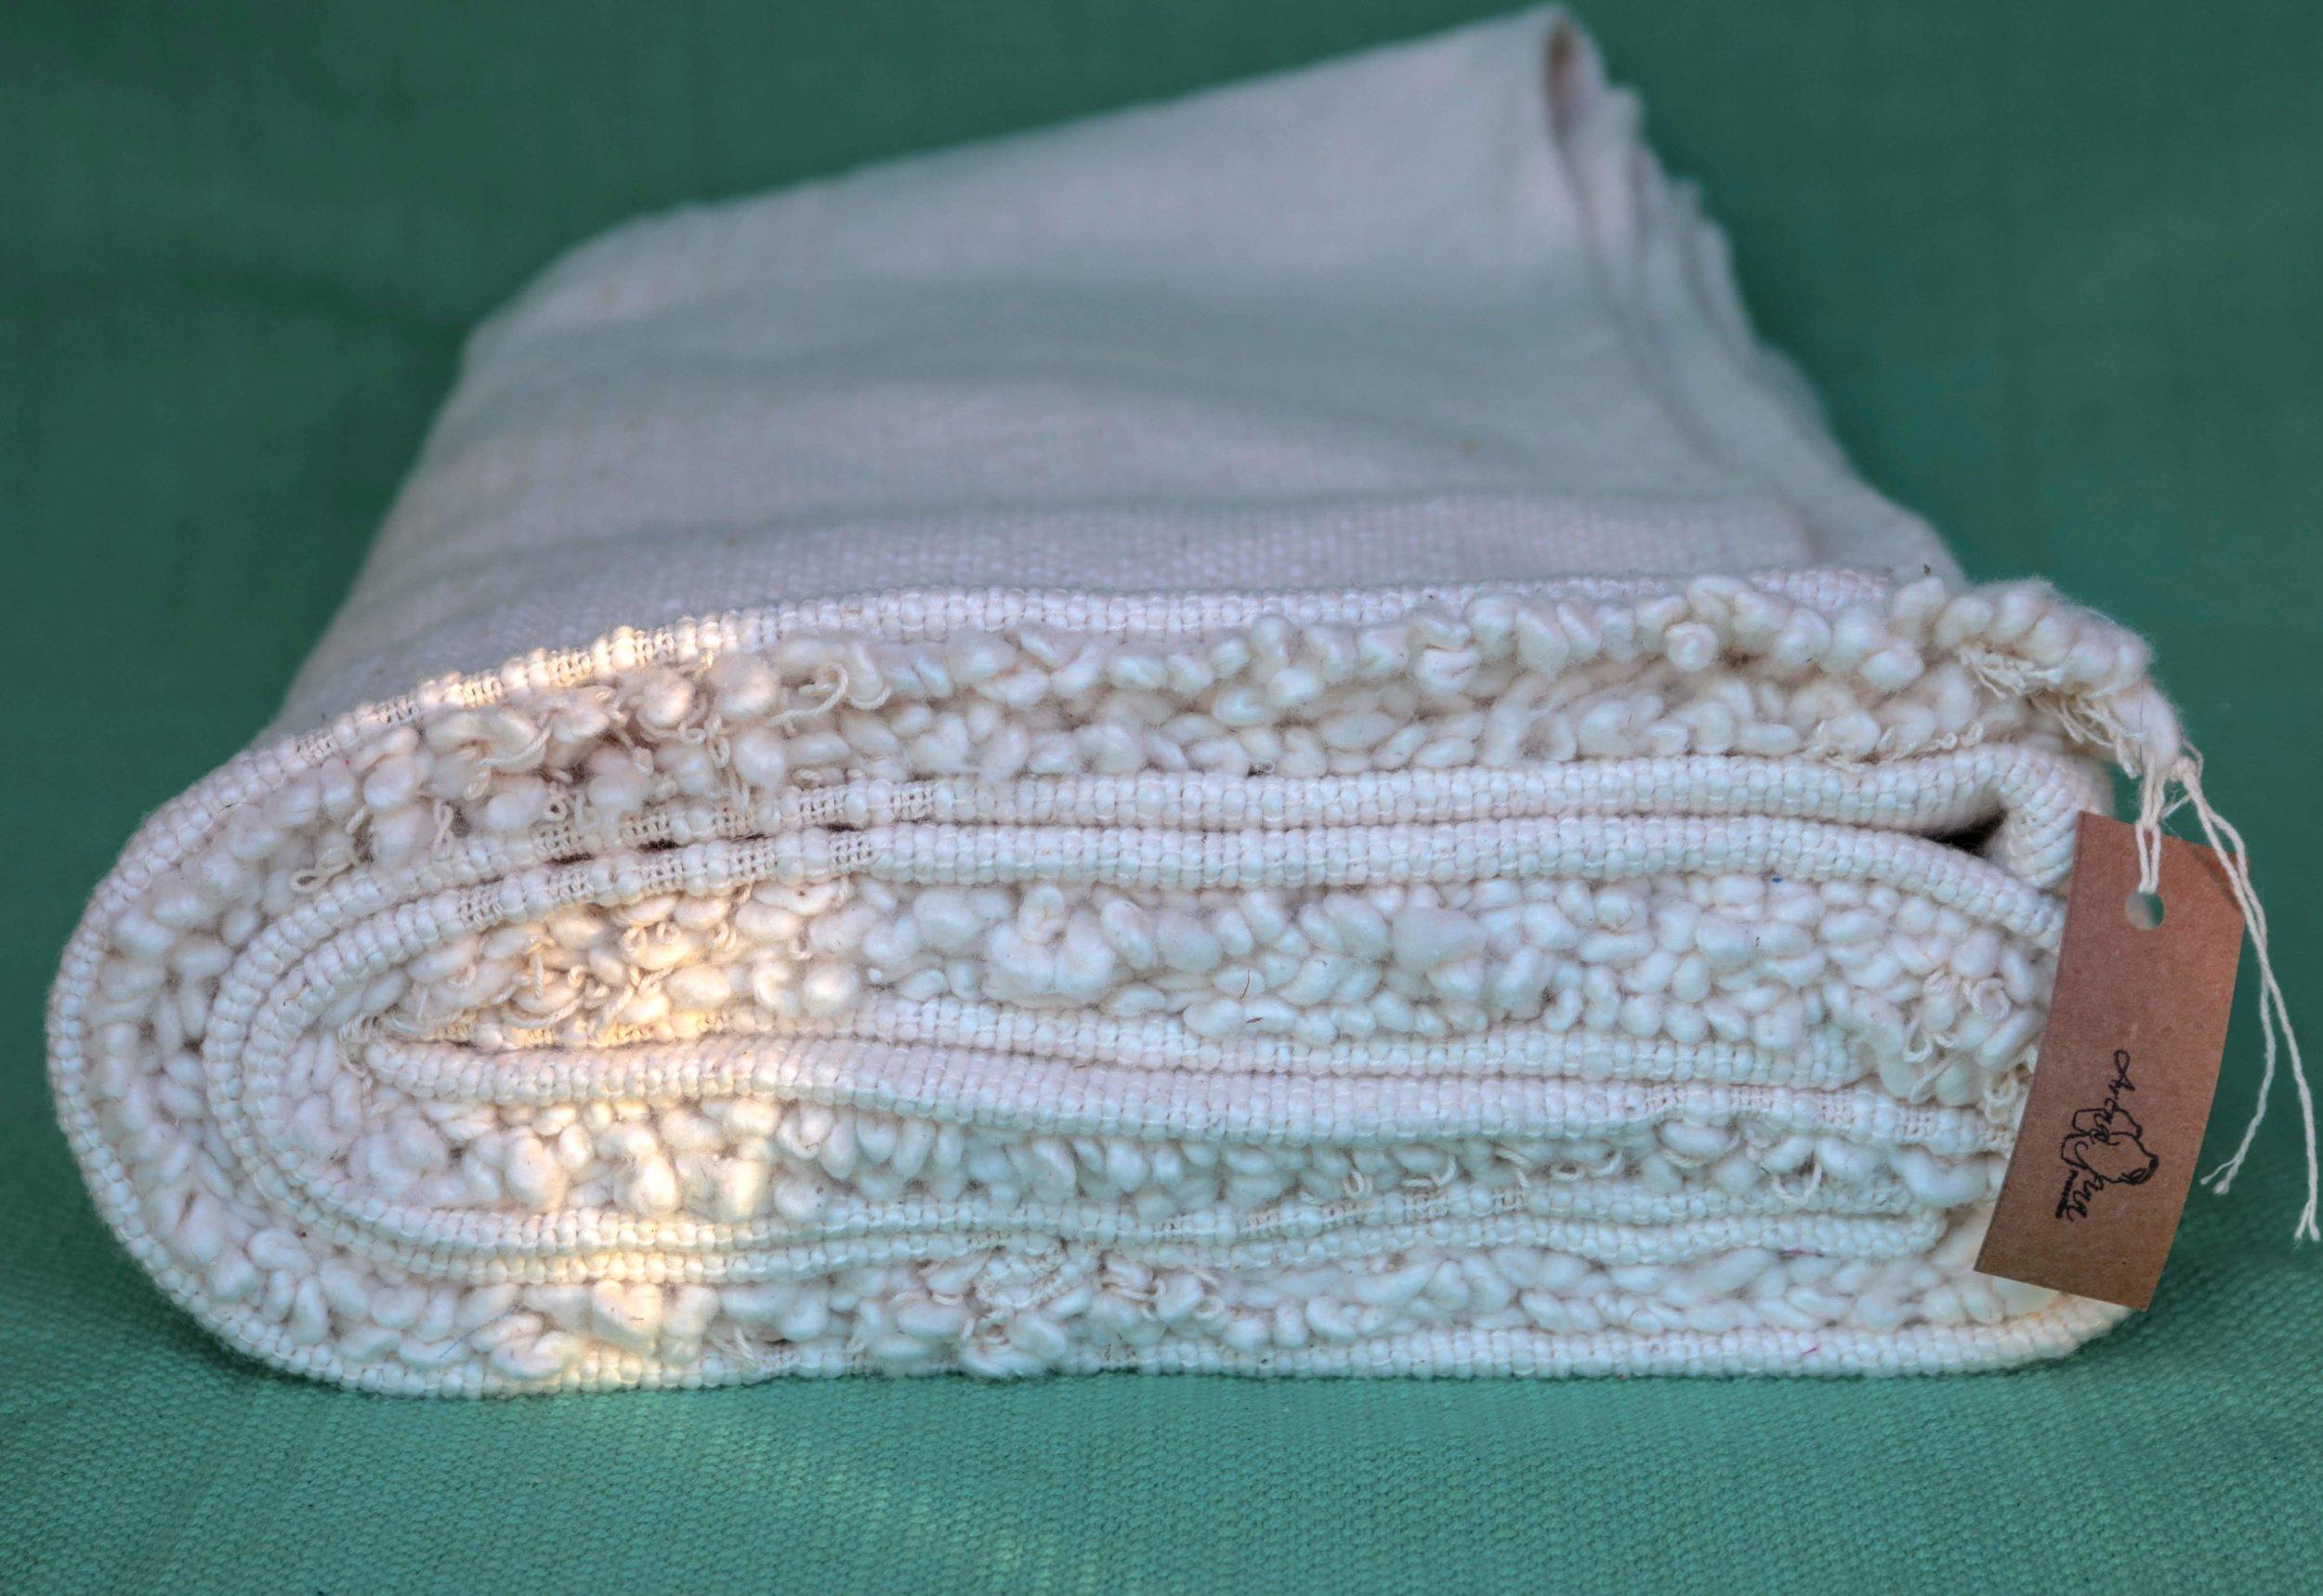 Blanket // Textile // Handwoven // Paraguay